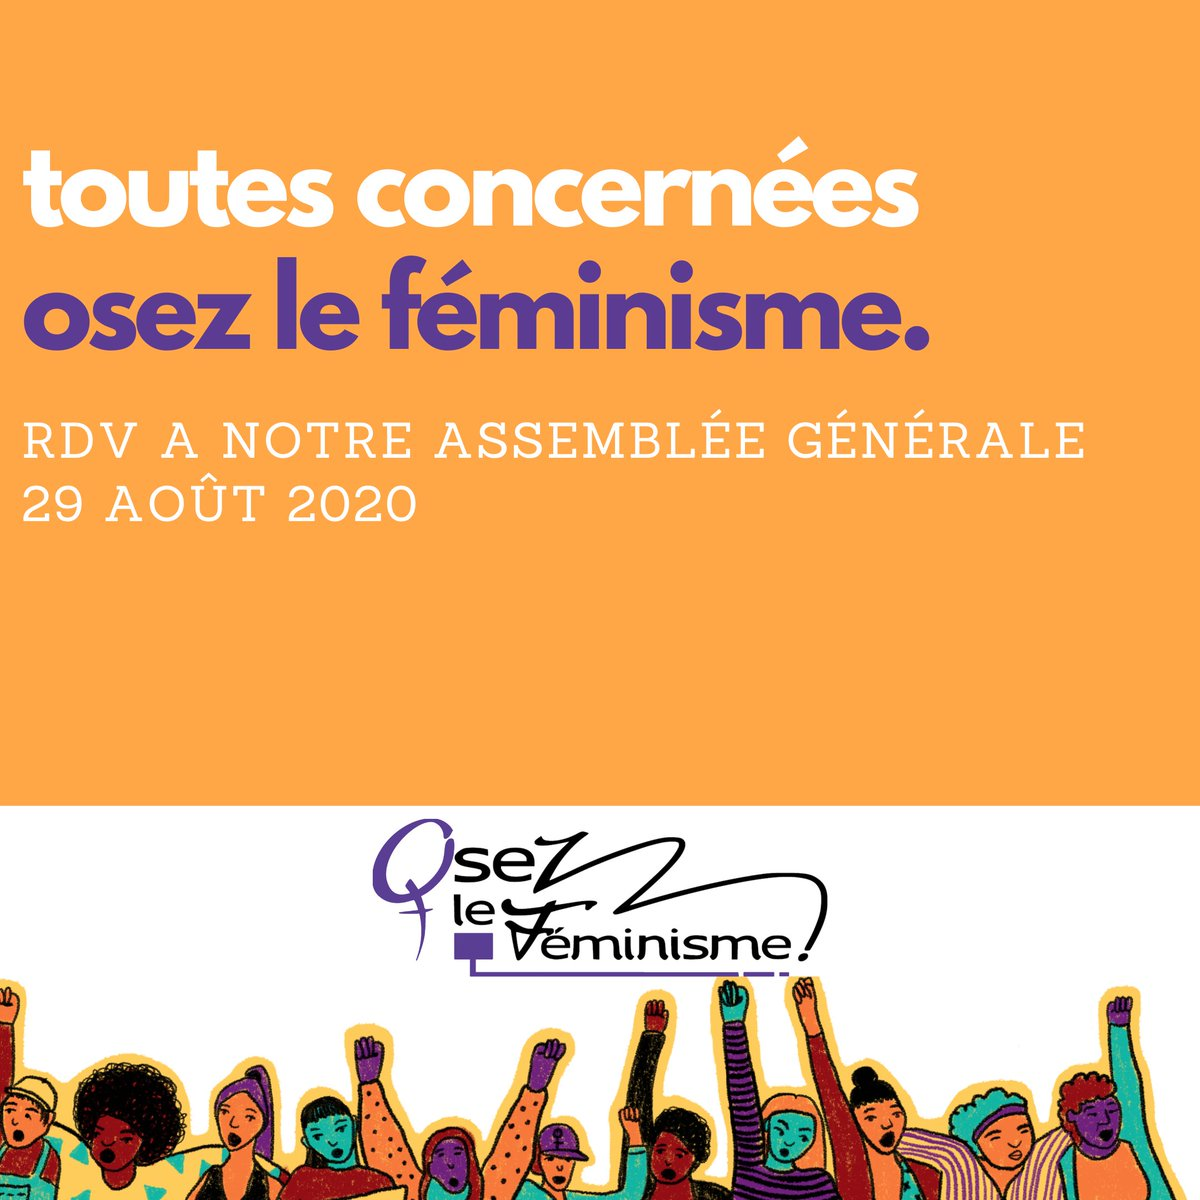 osezlefeminisme photo